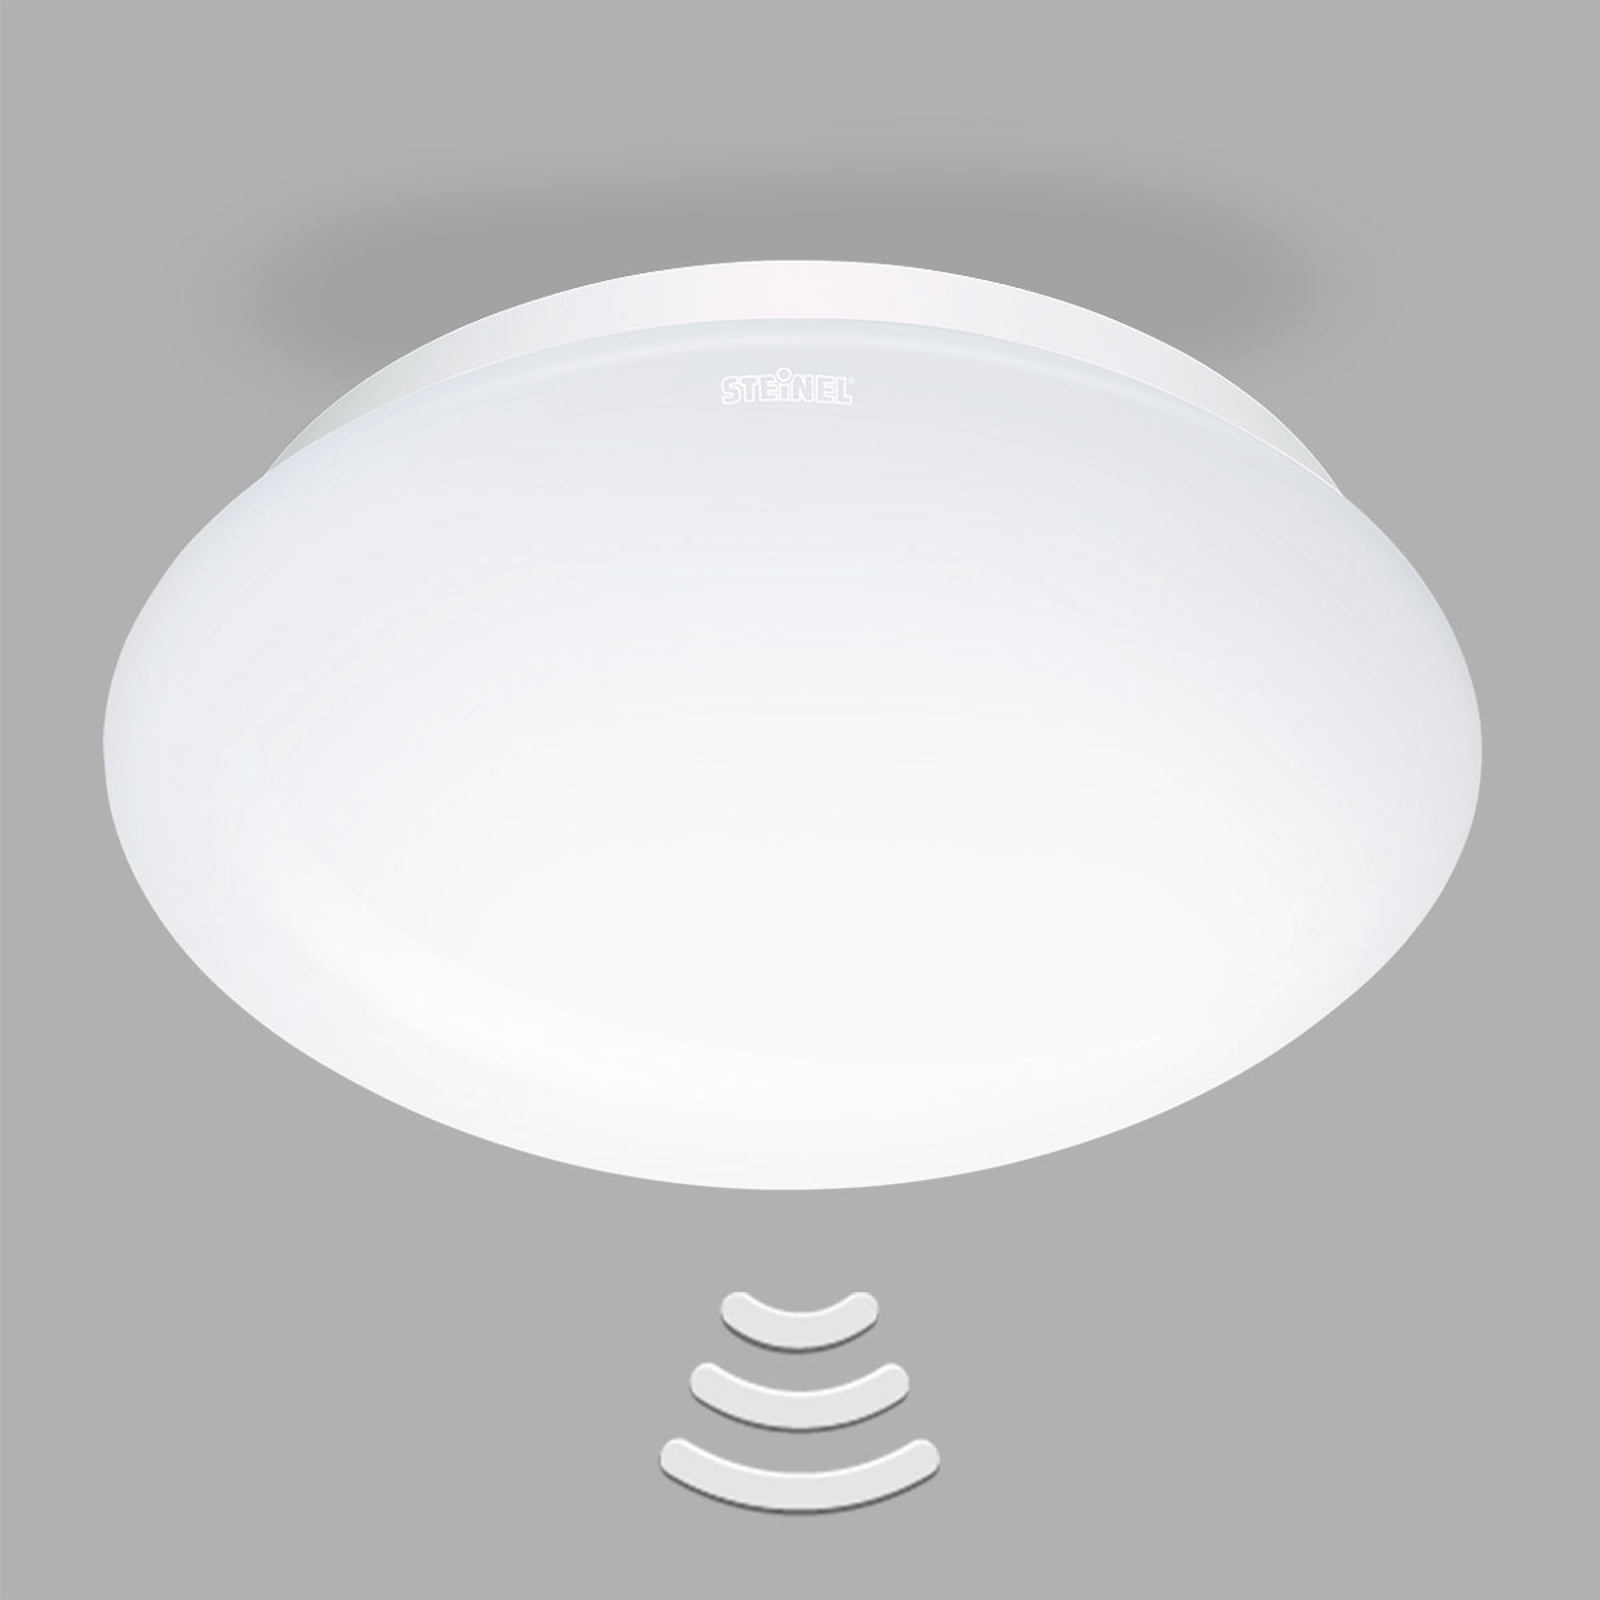 STEINEL RS PRO P1 sensor-LED-taklampe, 4000K